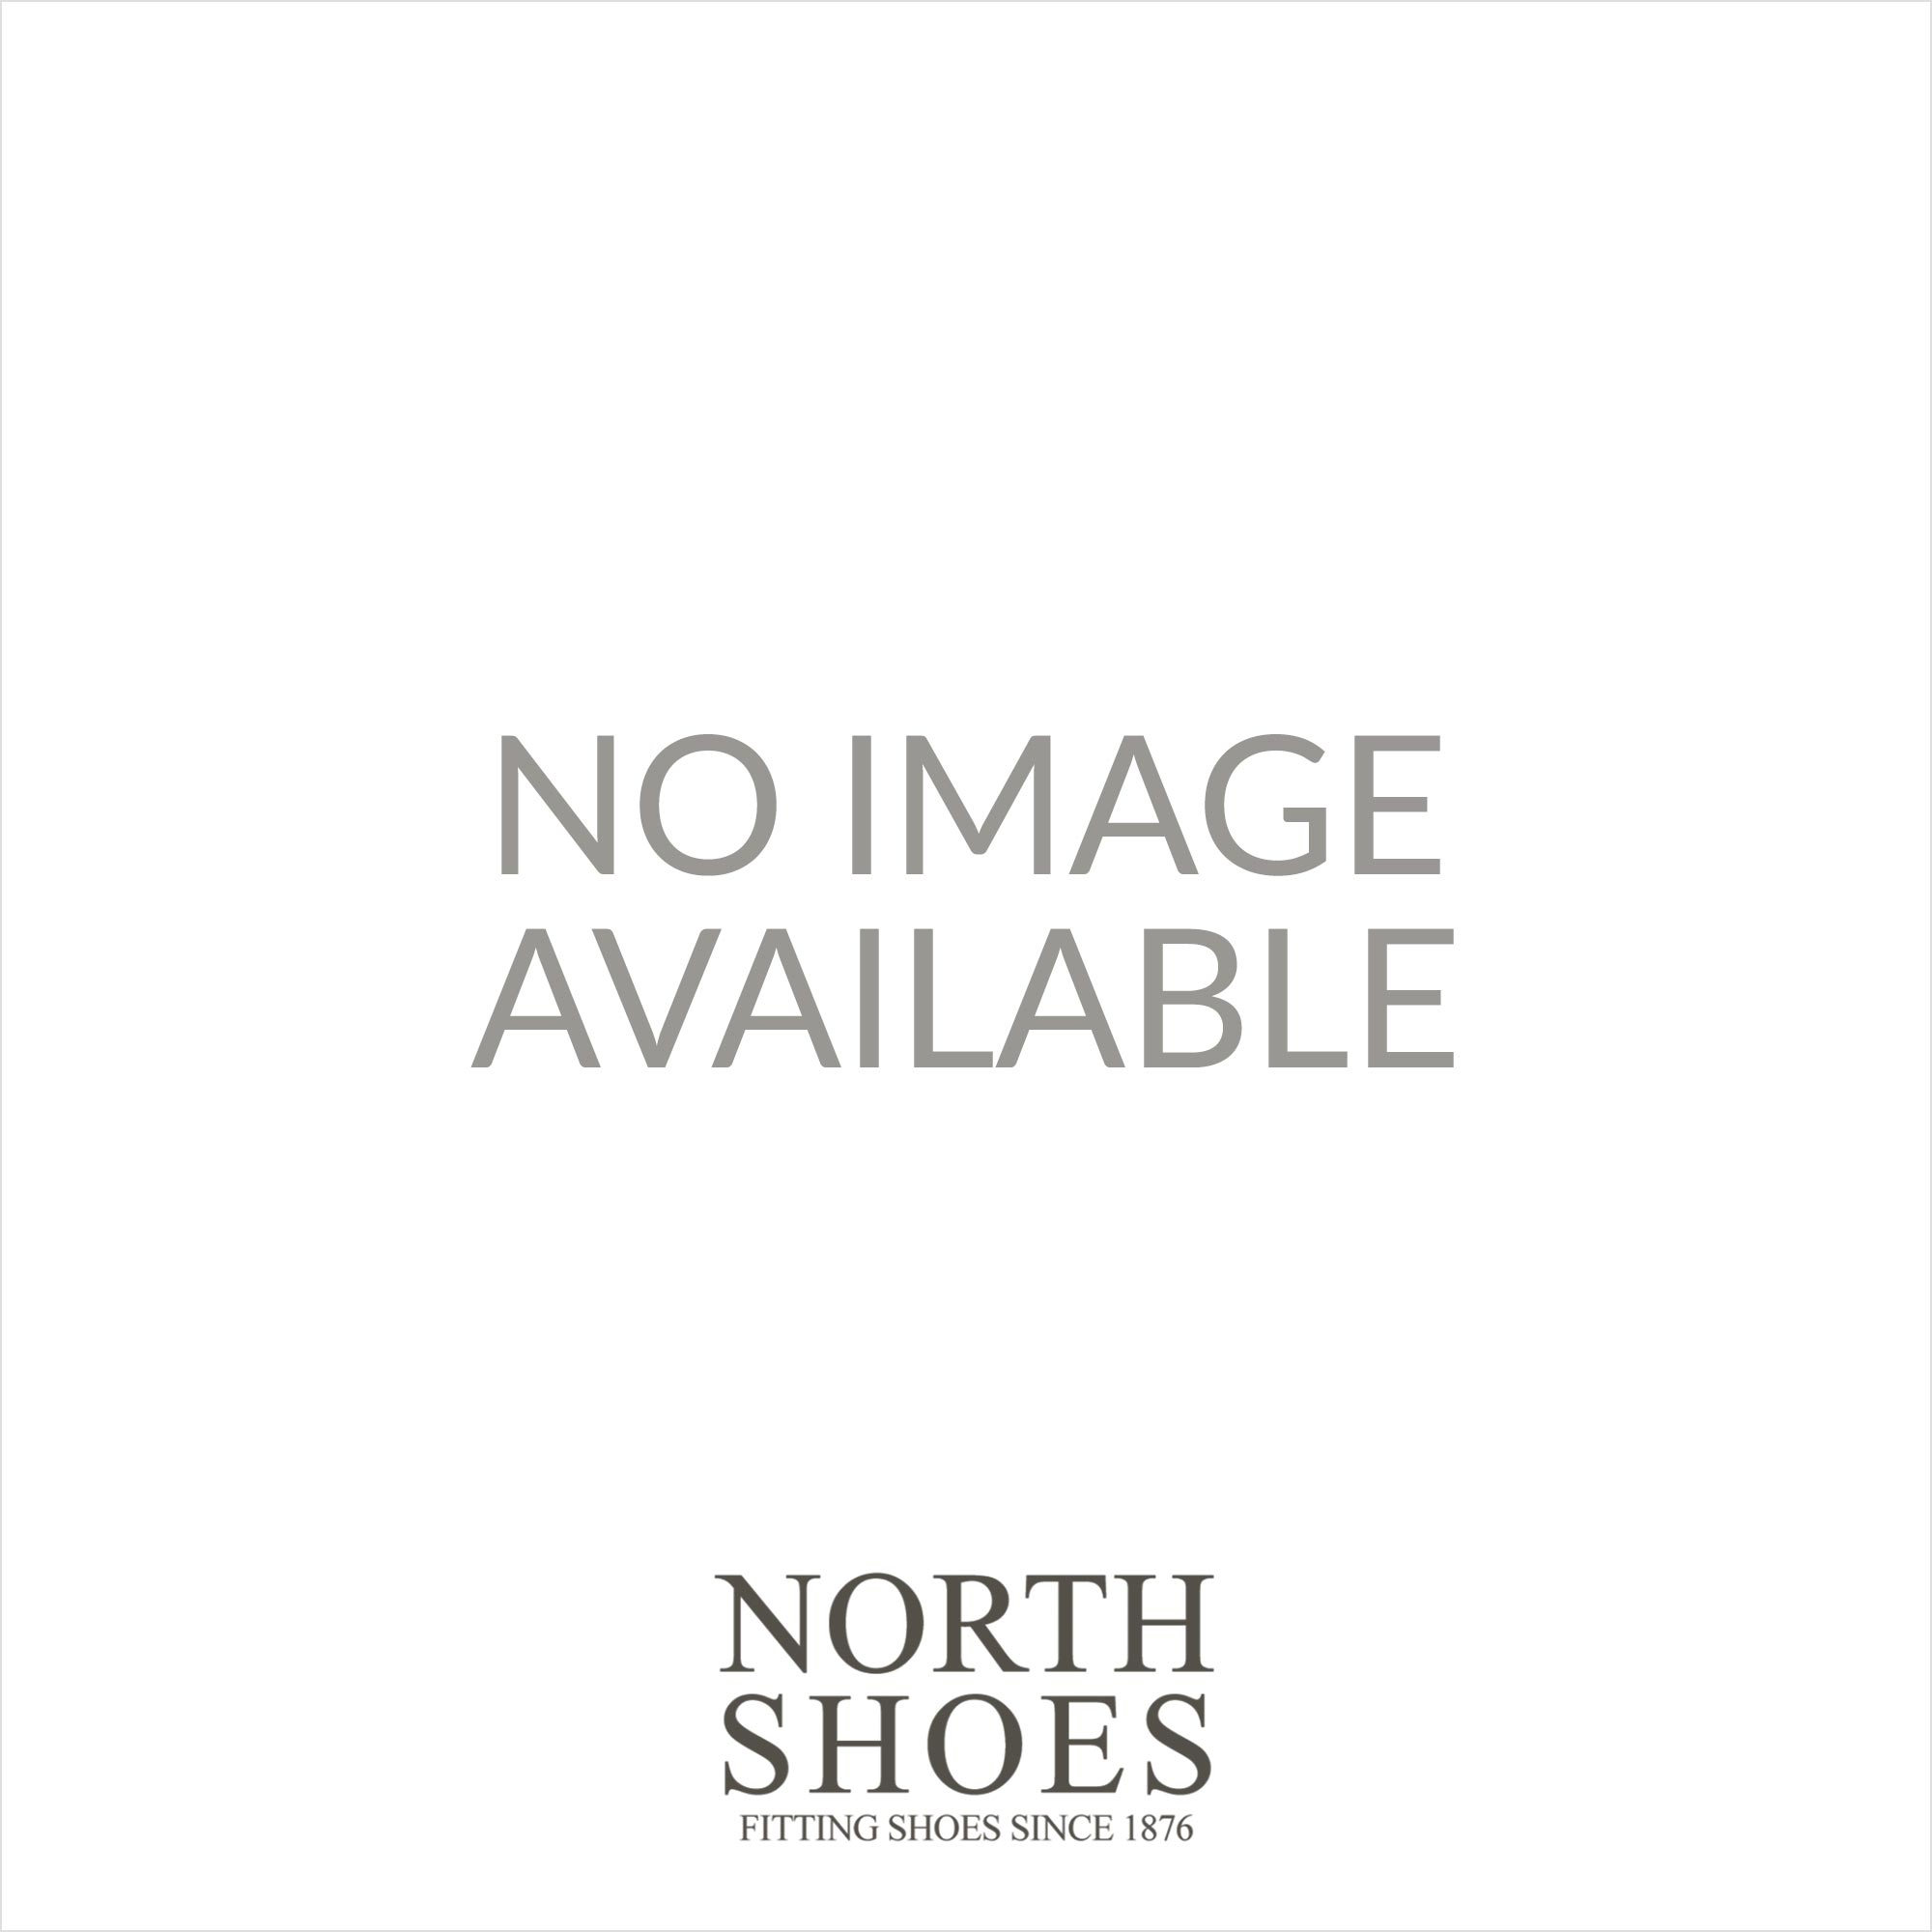 63d797495fad Clarks Ivy Blossom Junior White Leather Girls Open Toe Sandal ...